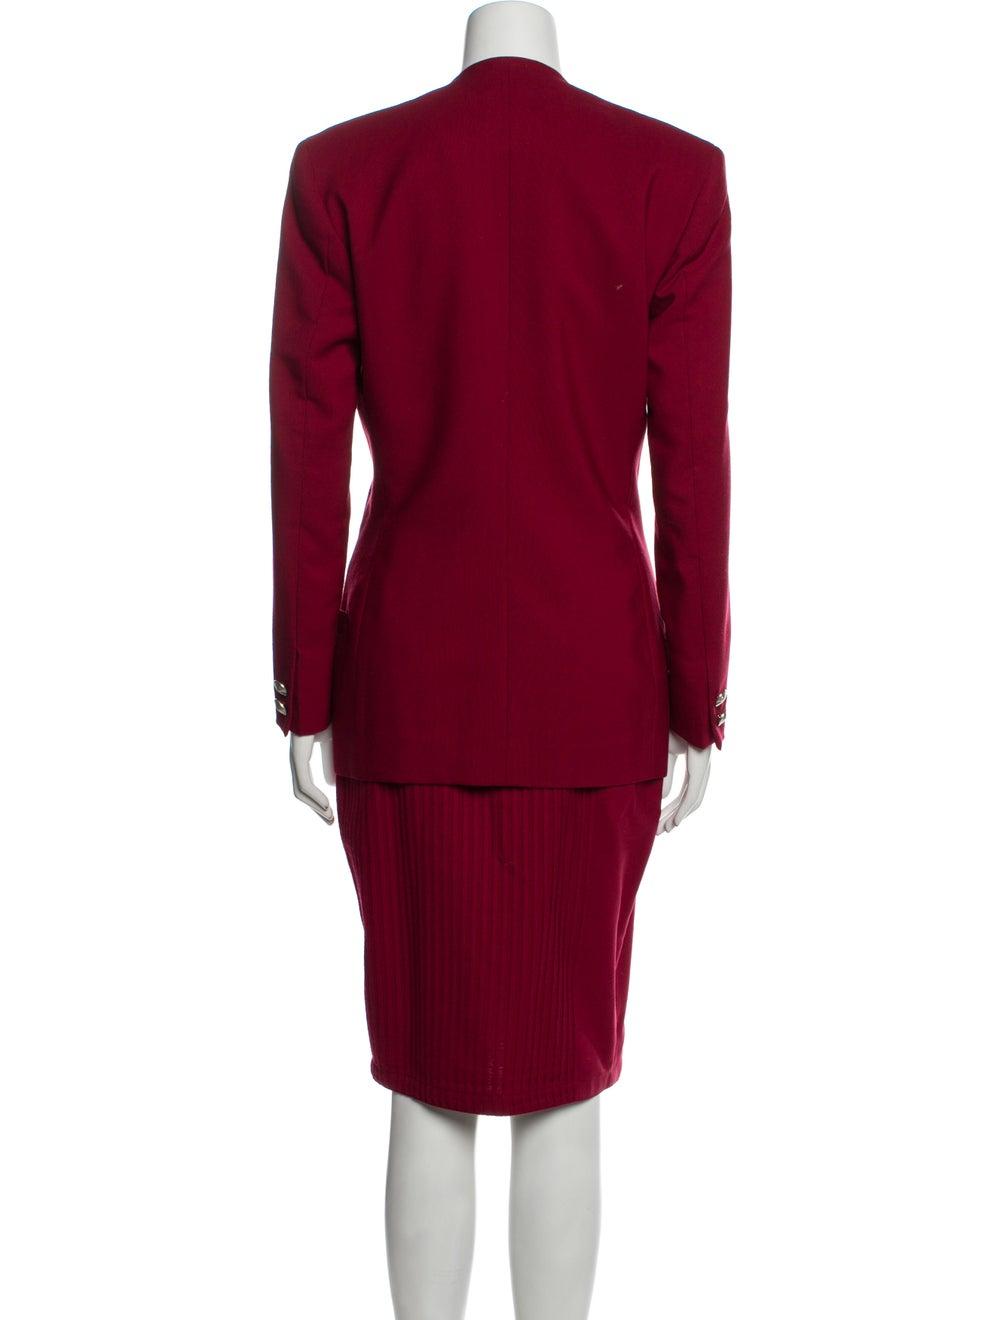 Gianni Versace Vintage 1990 Skirt Suit Wool - image 3